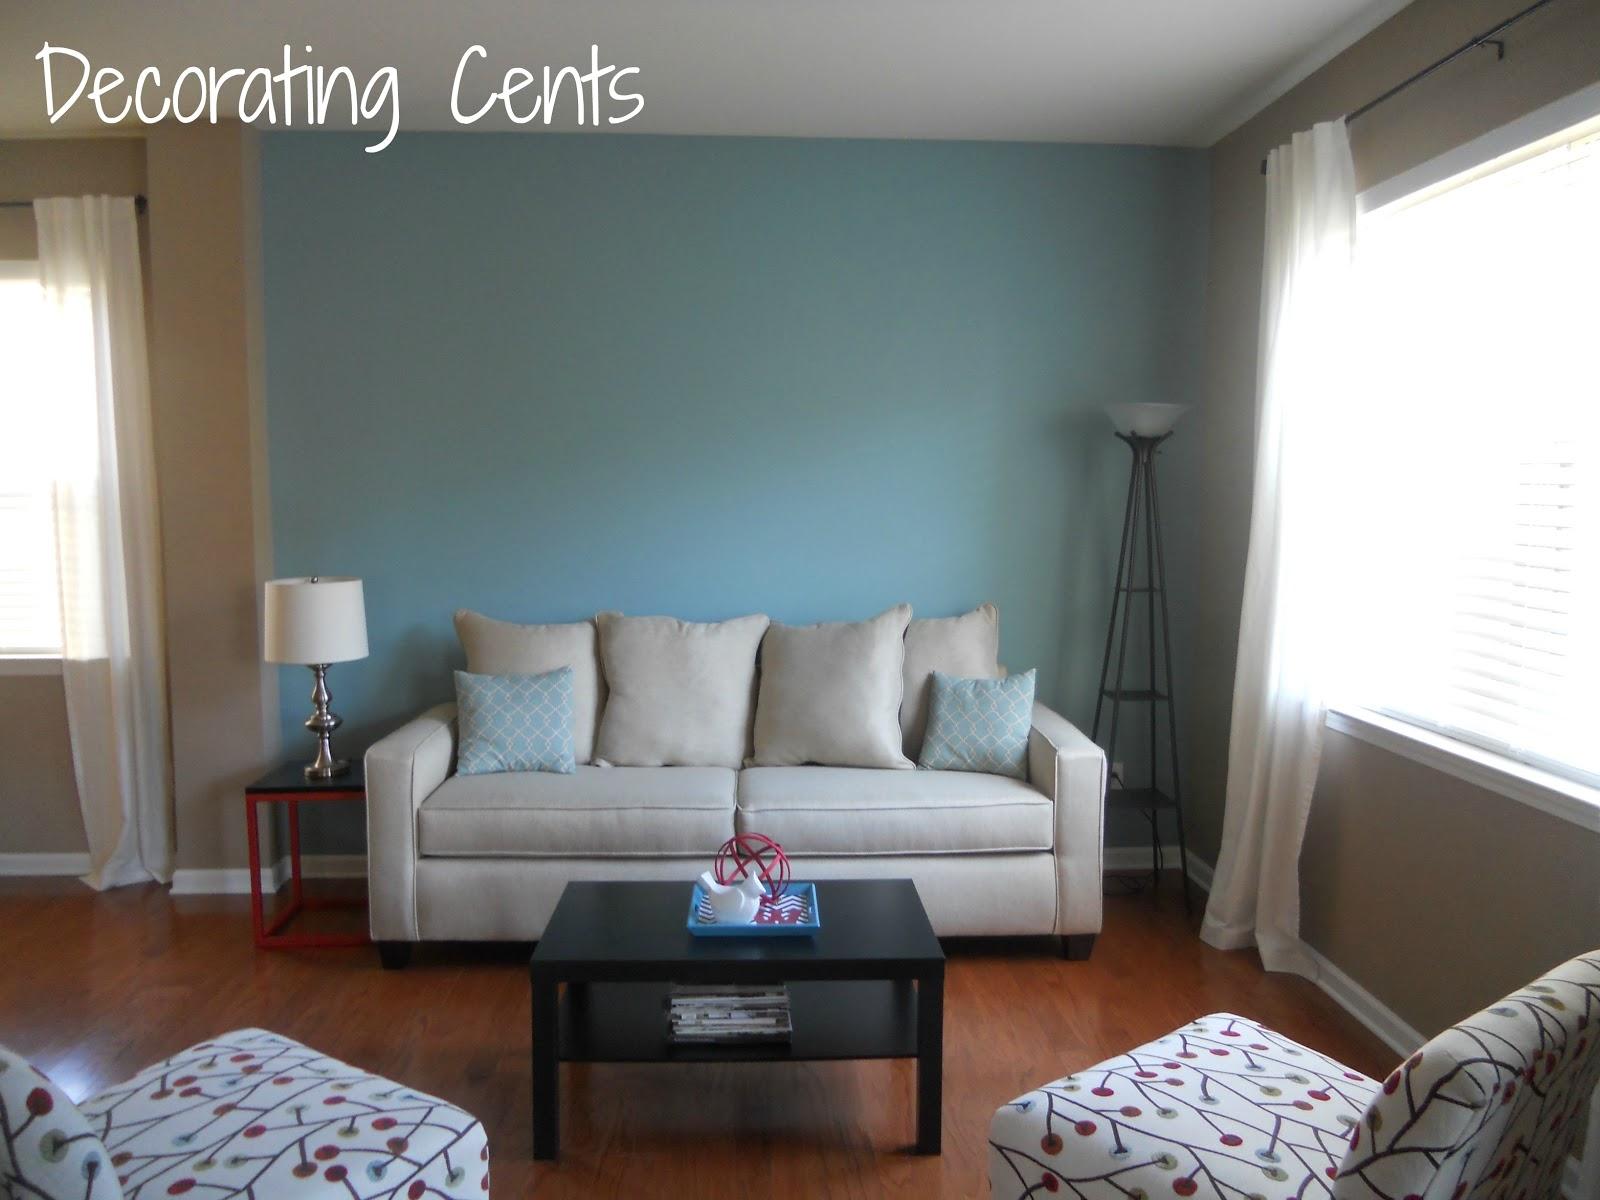 Decorating Cents: November 2012